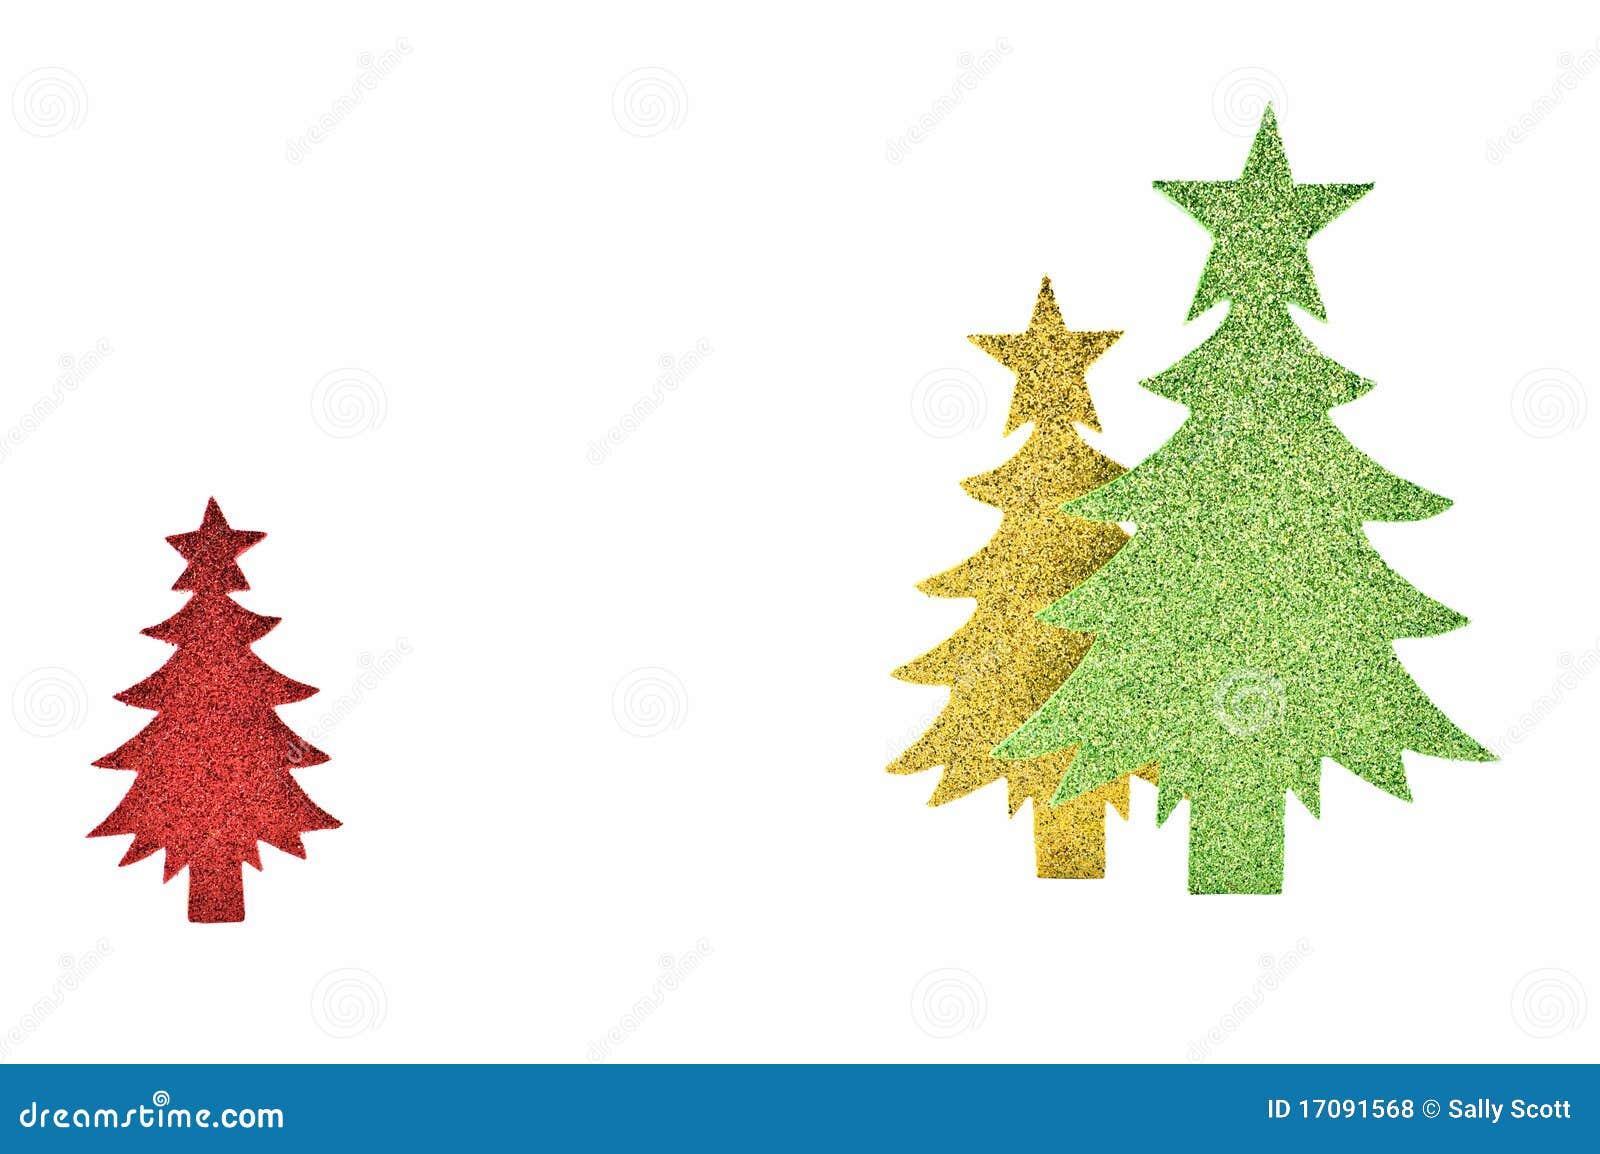 Sparkly Papierbäume